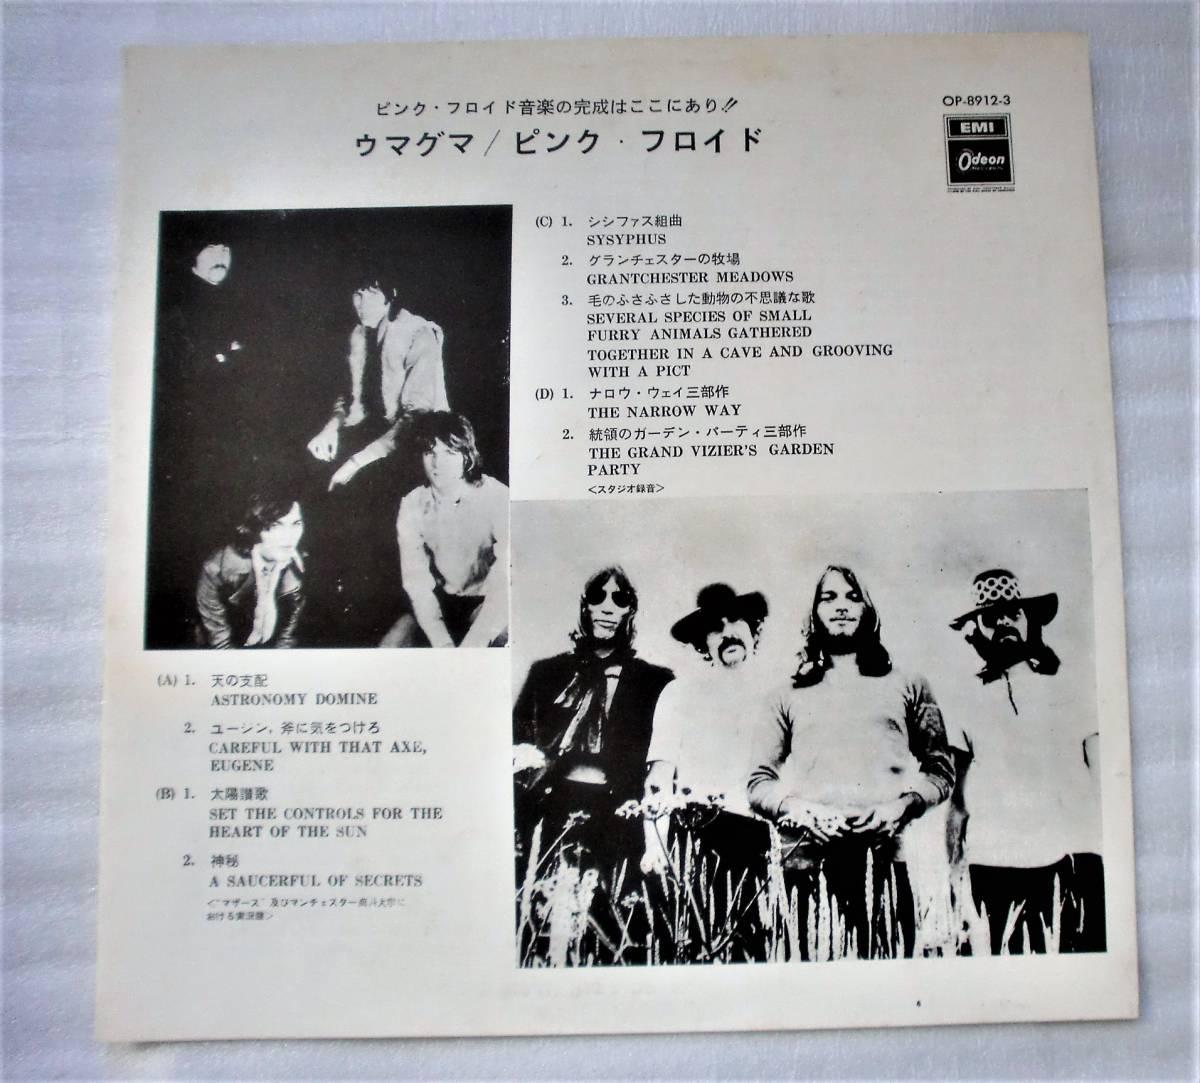 LP PINK FLOYD/ピンクフロイド/UMMAGUMMA/ウマグマ/帯_画像8